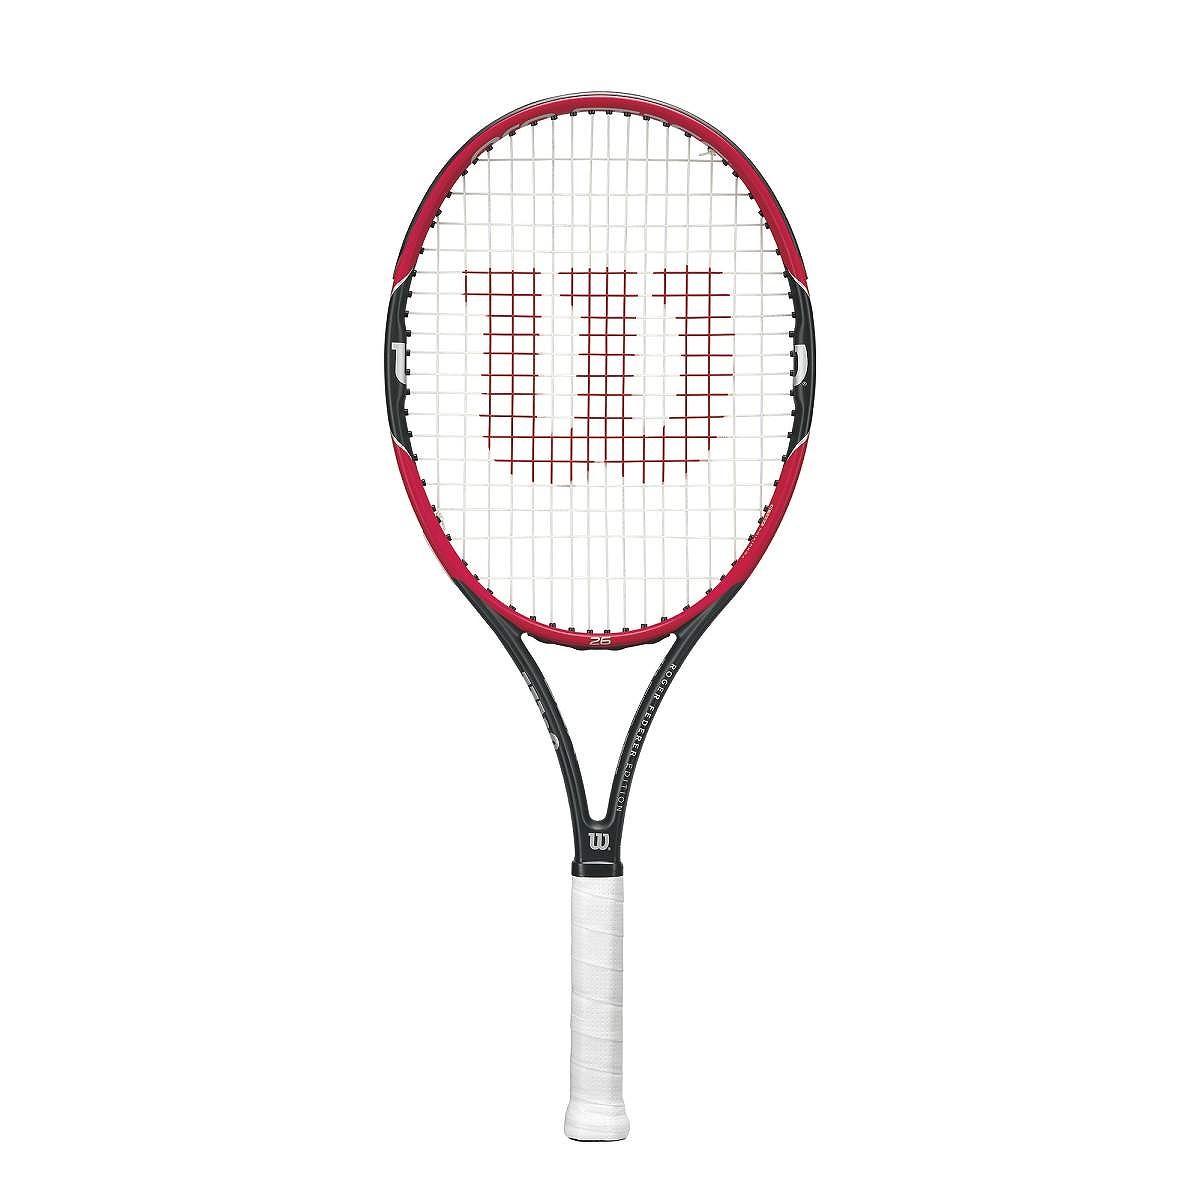 Rakieta tenisowa Wilson Pro Staff  26 RF